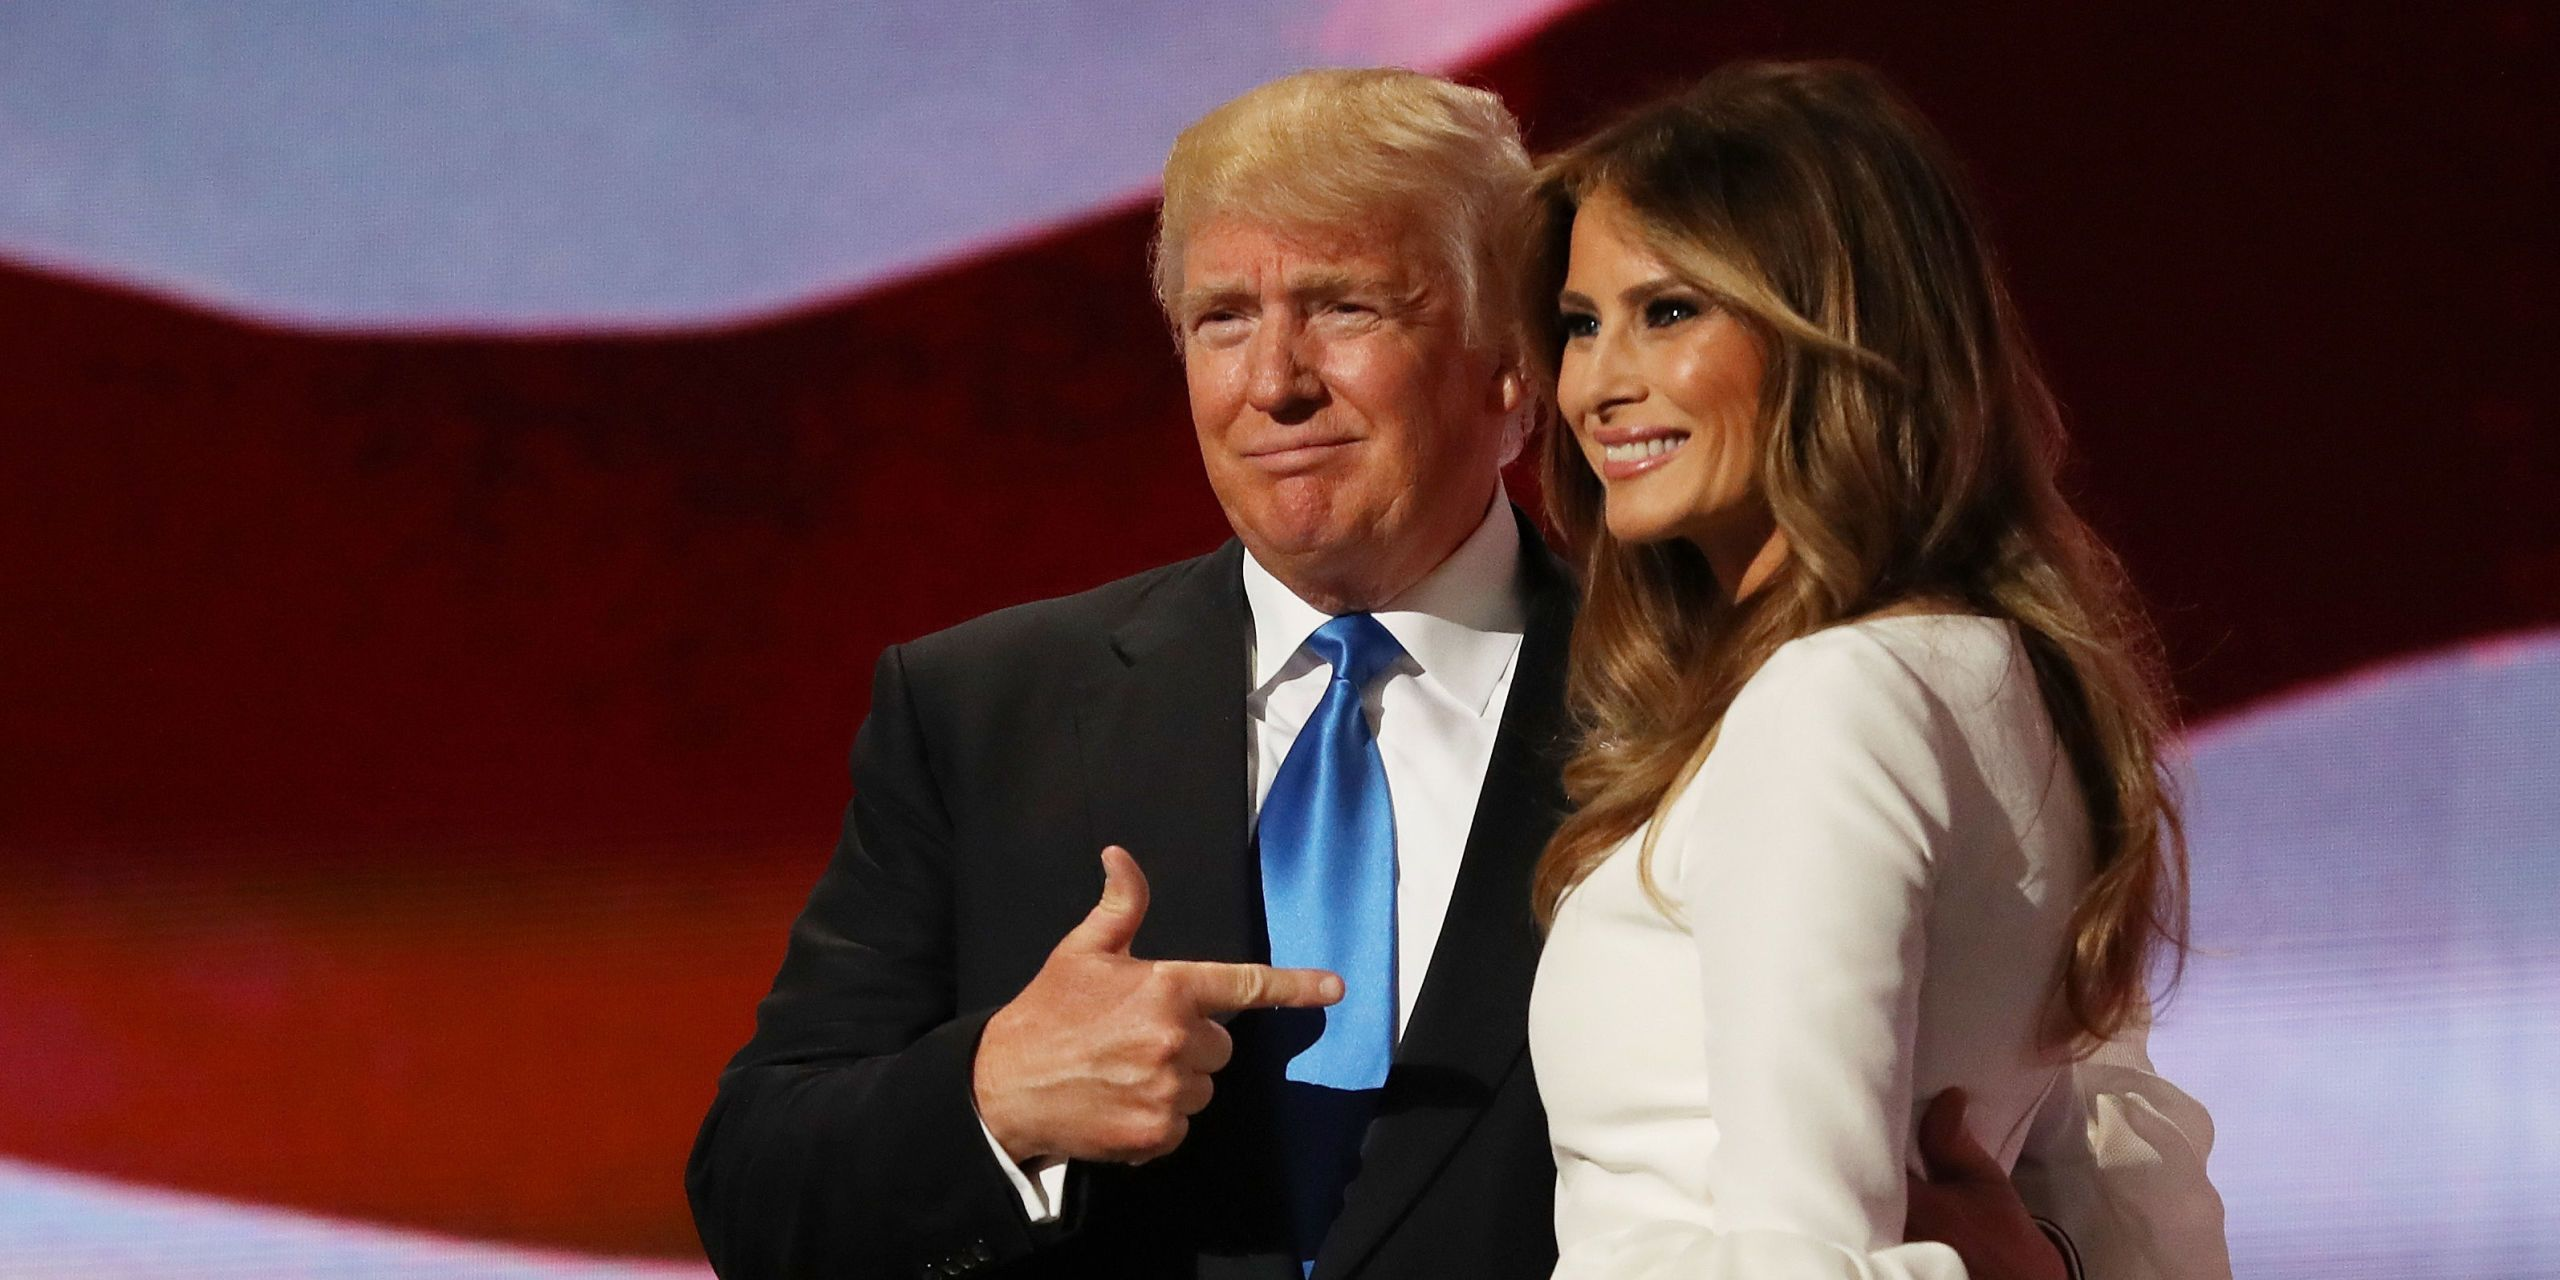 Donald Trump Doesnt Wear a Wedding Ring Why Doesnt Trump Wear a